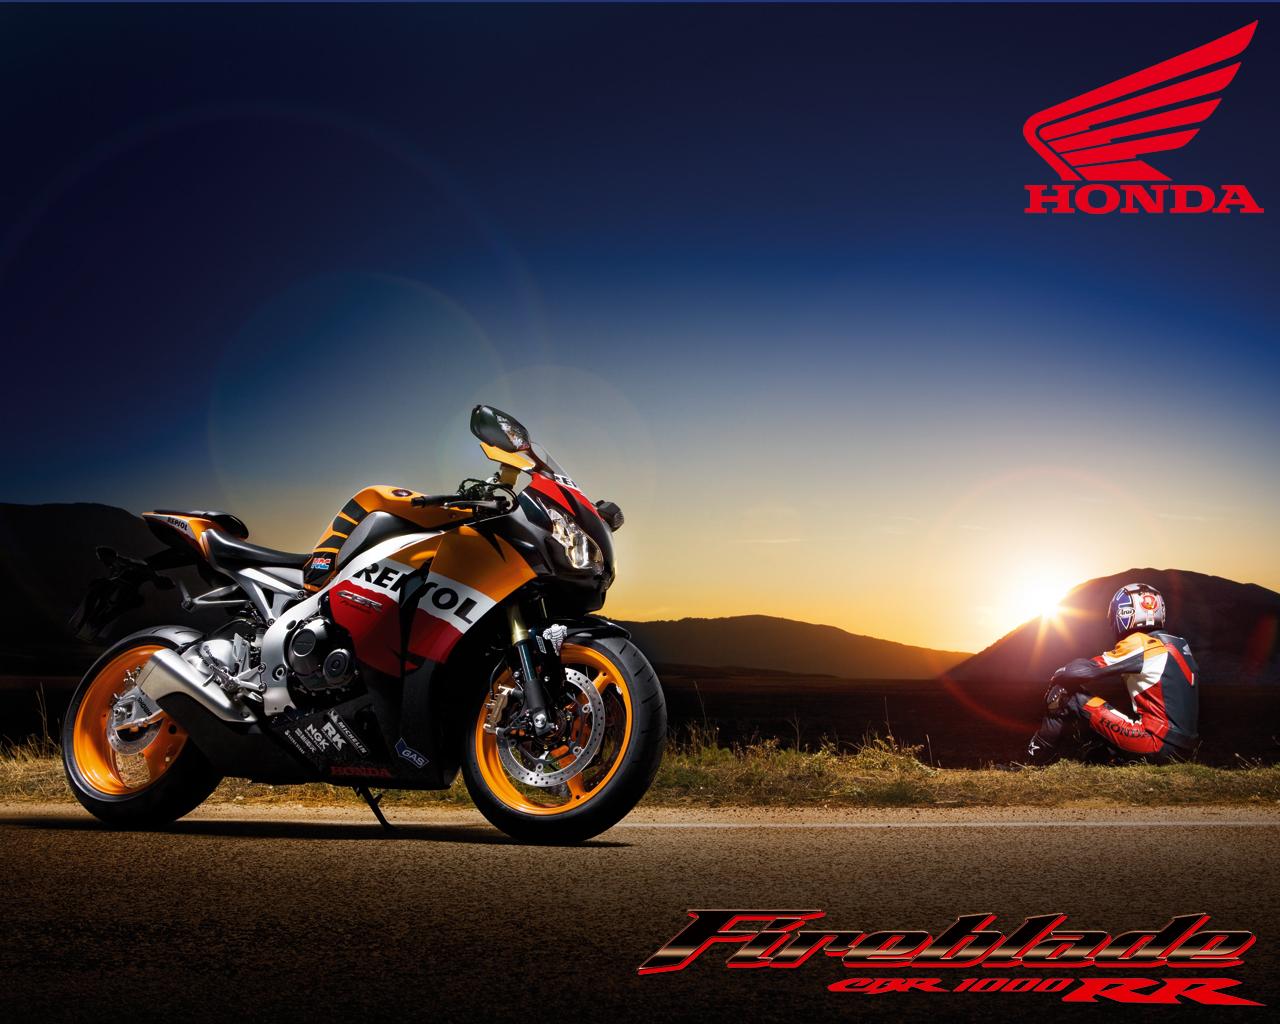 download Honda Repsol Wallpaper [1280x1024] for your Desktop 1280x1024